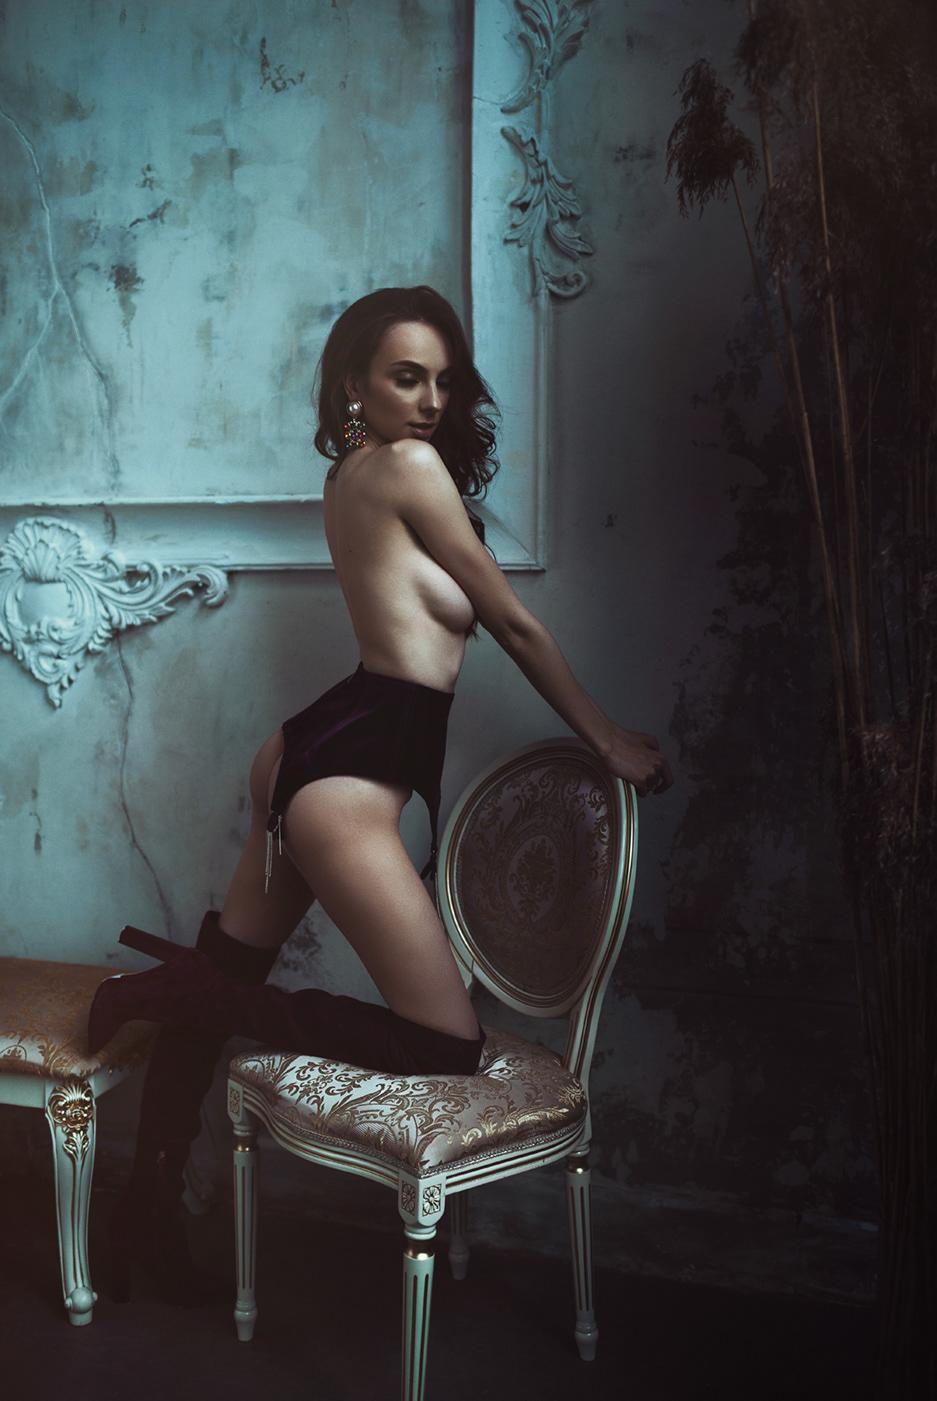 Model Margo Amp / Photographer Bugaenko Dmitry